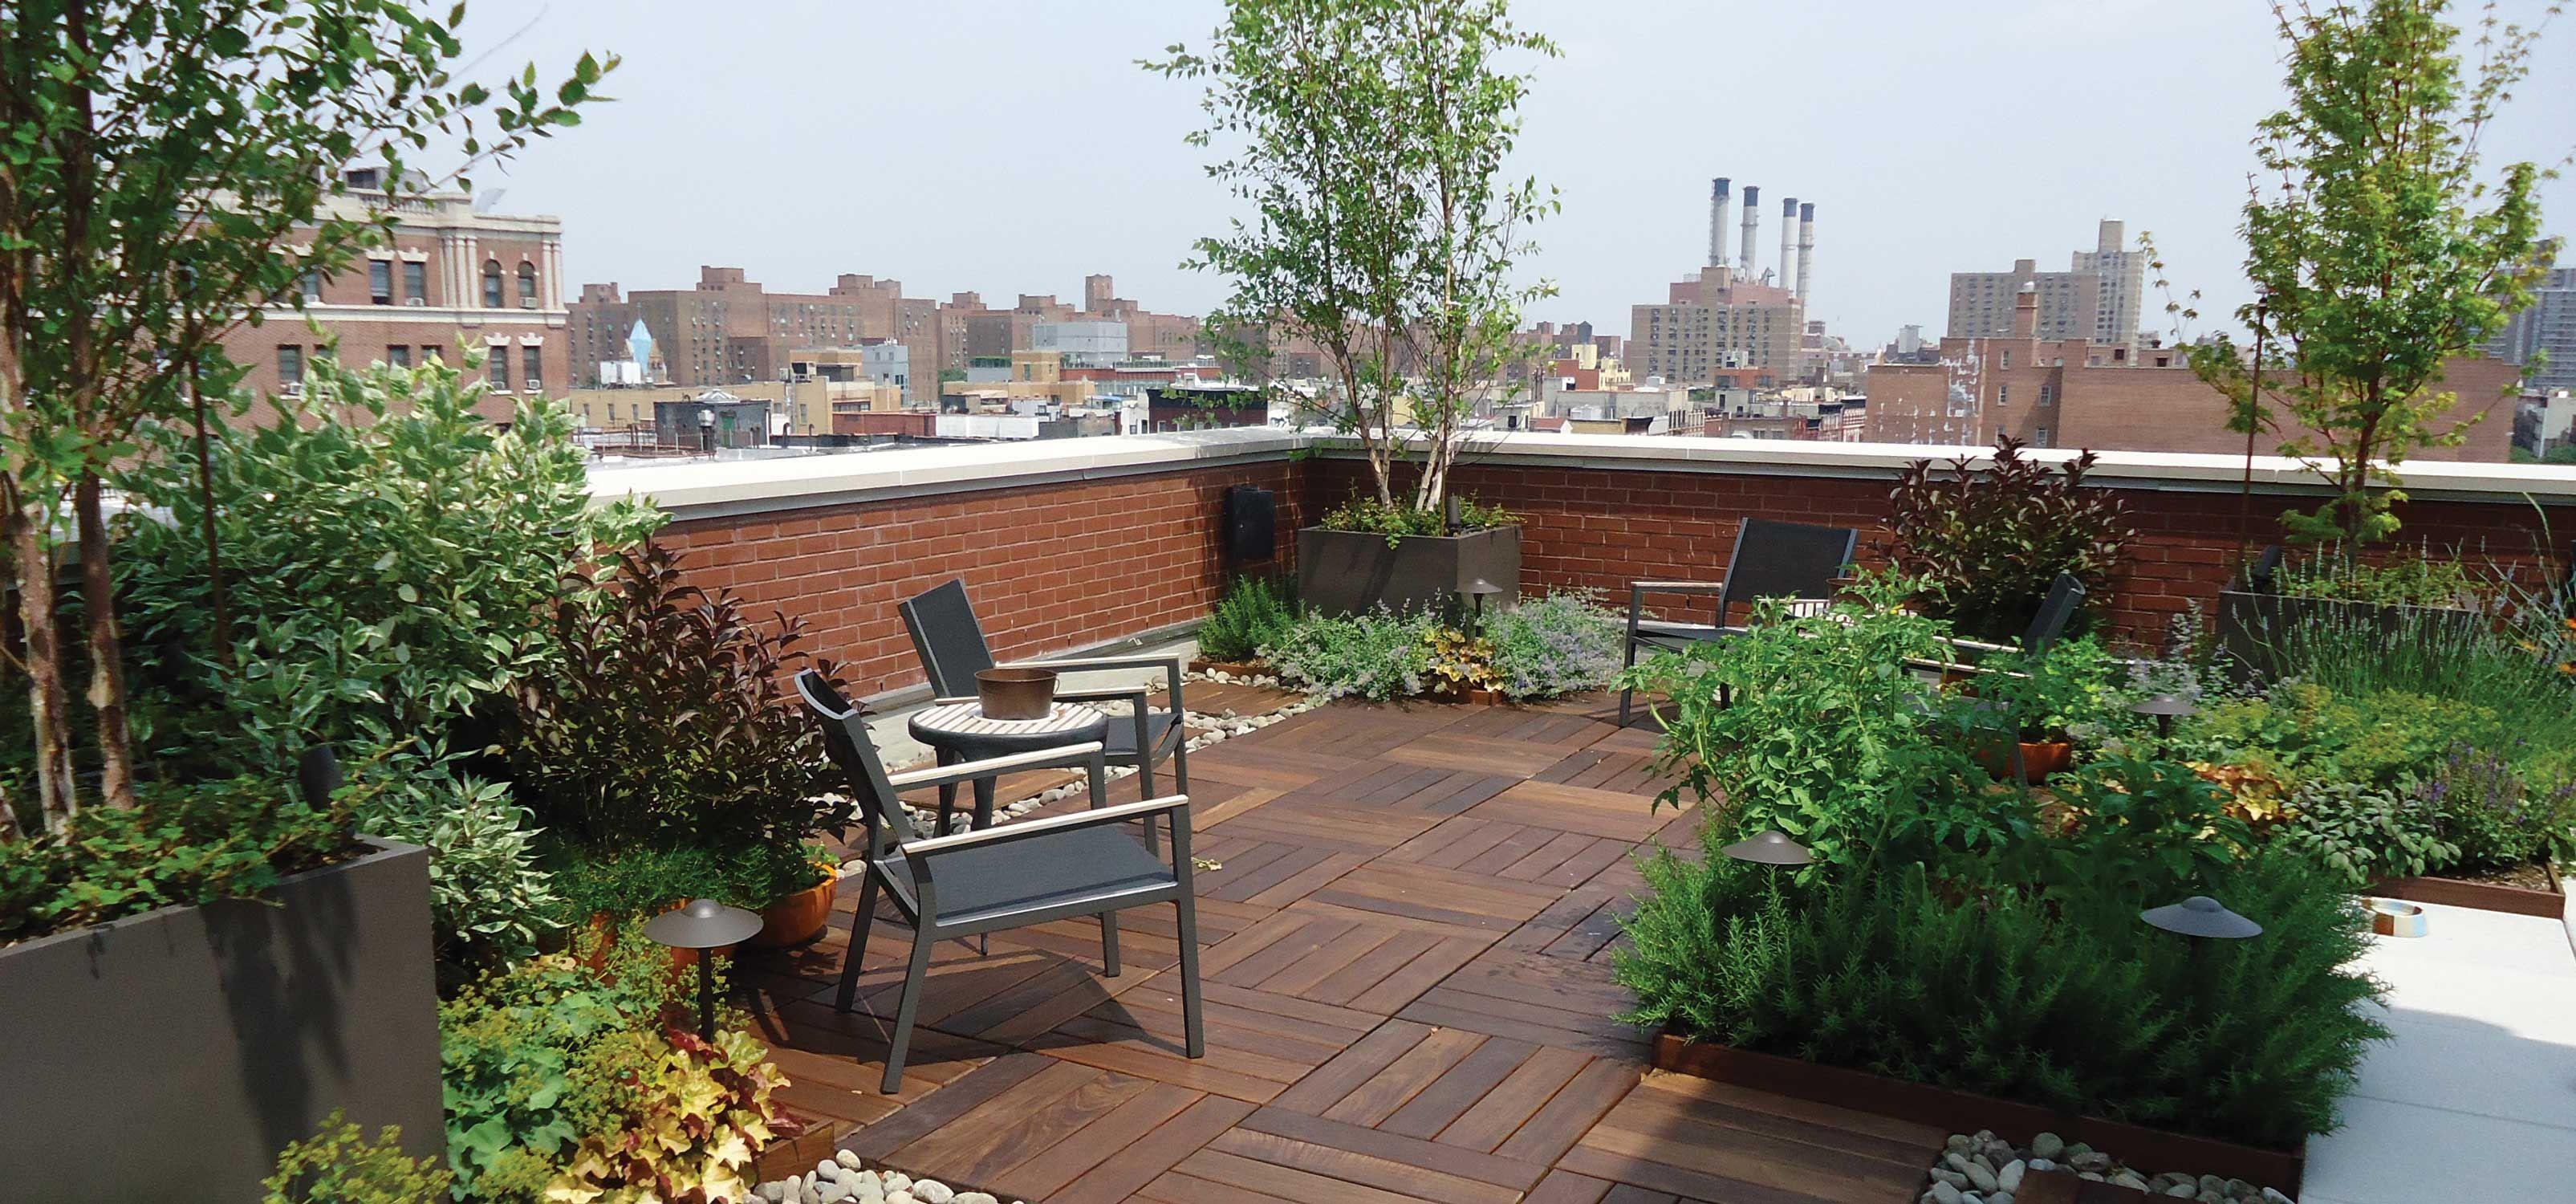 Beau Roof Deck